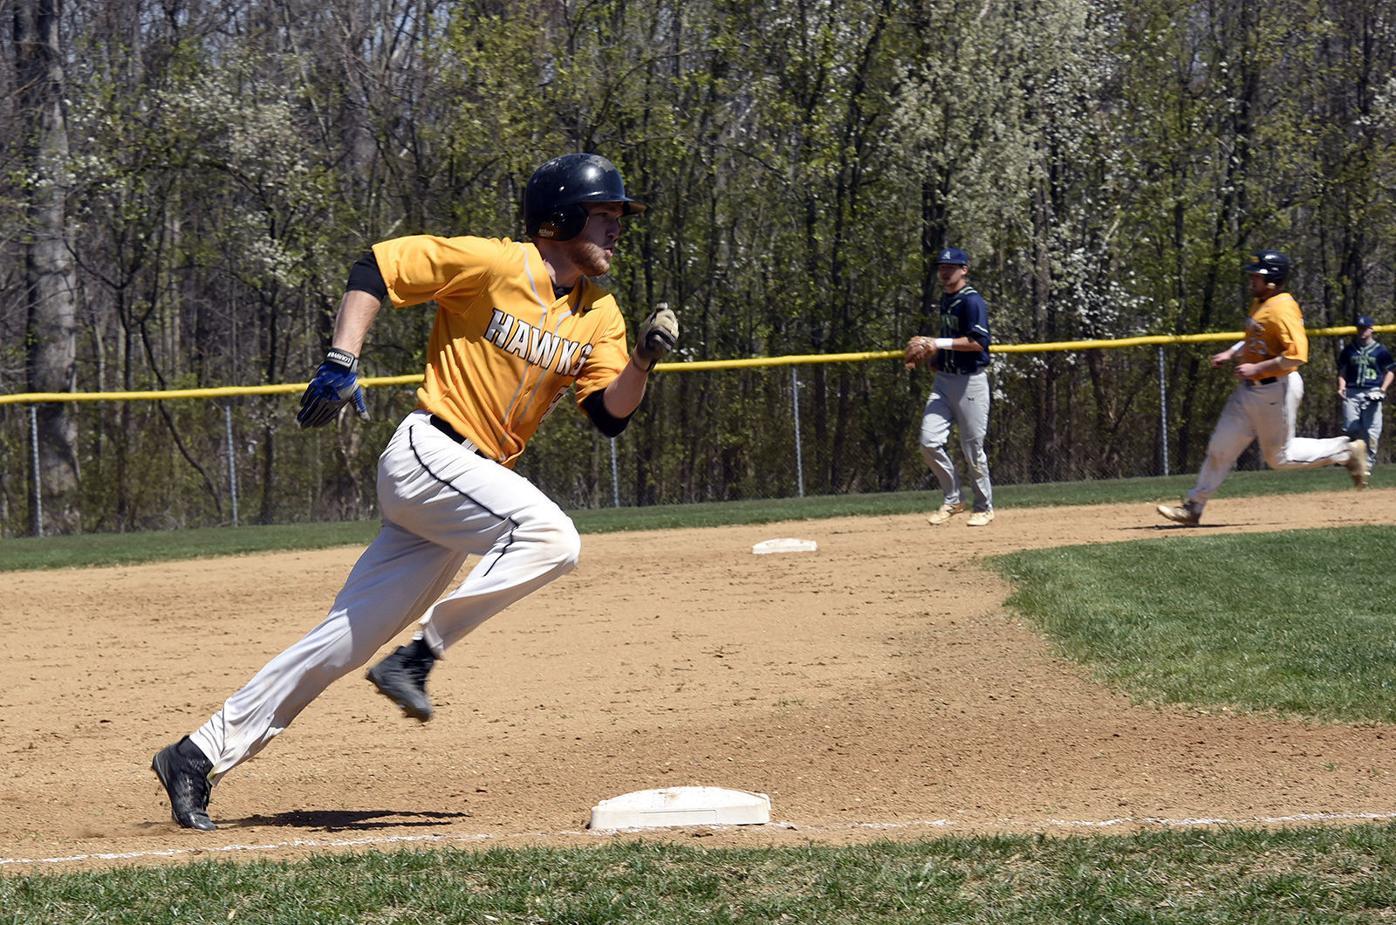 College Of Southern Maryland Baseball Sees Nine Game Win Streak End News Somdnews Com